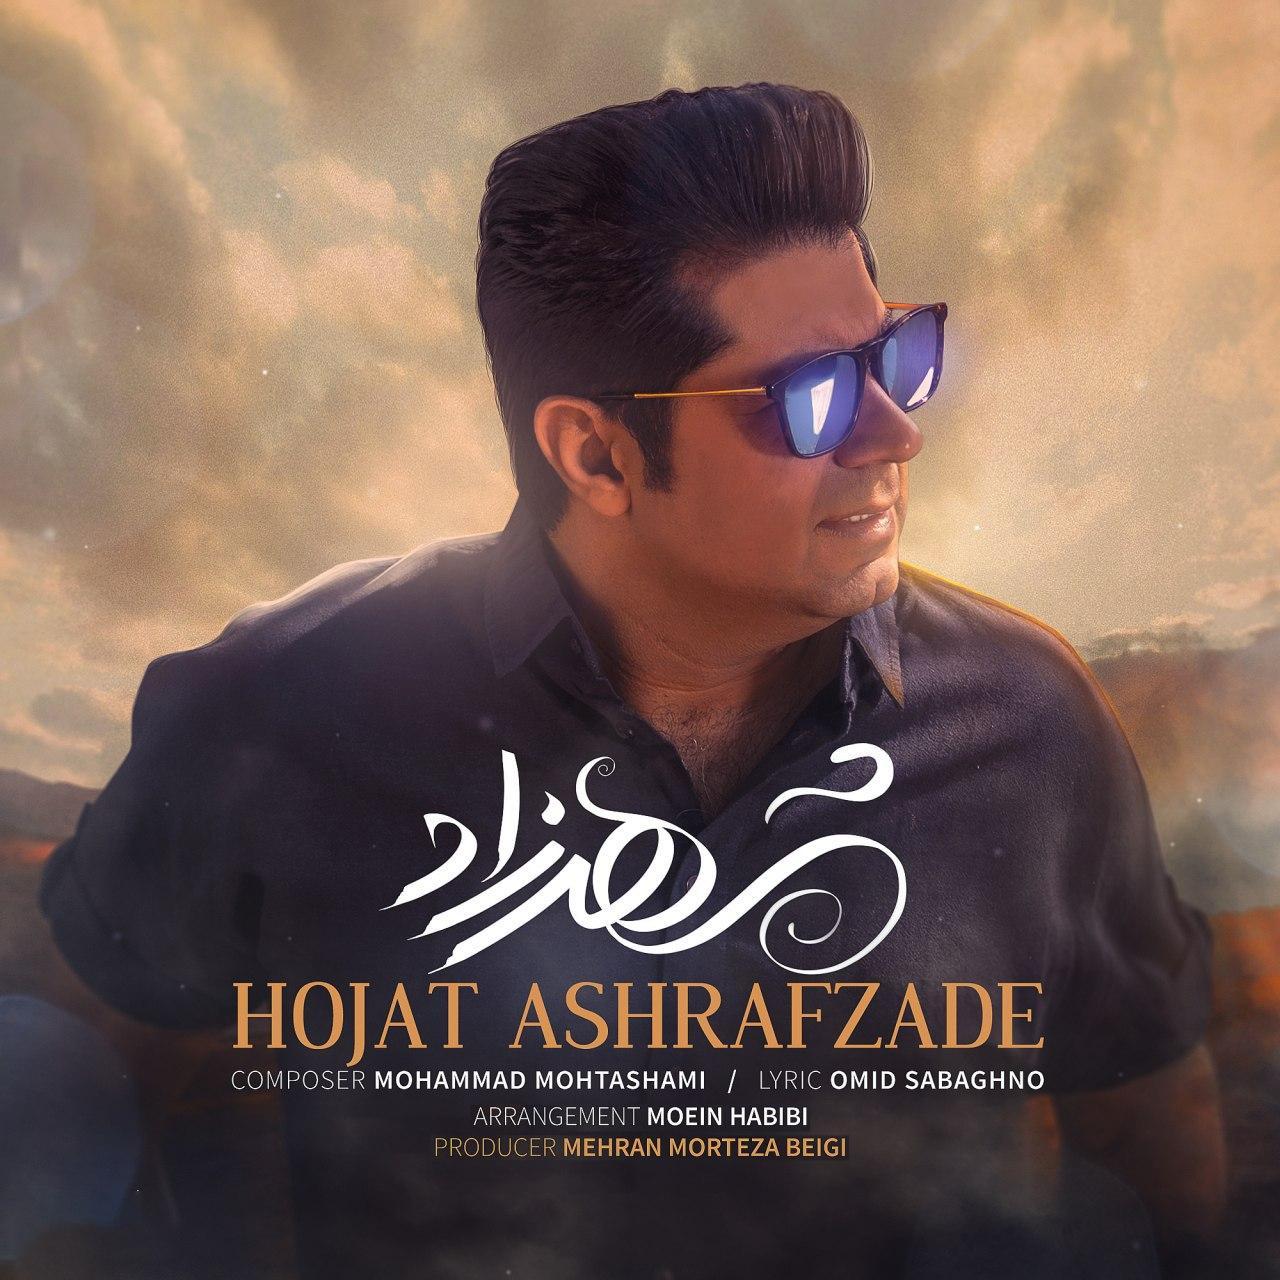 Hojat Ashrafzade – Shahrzad